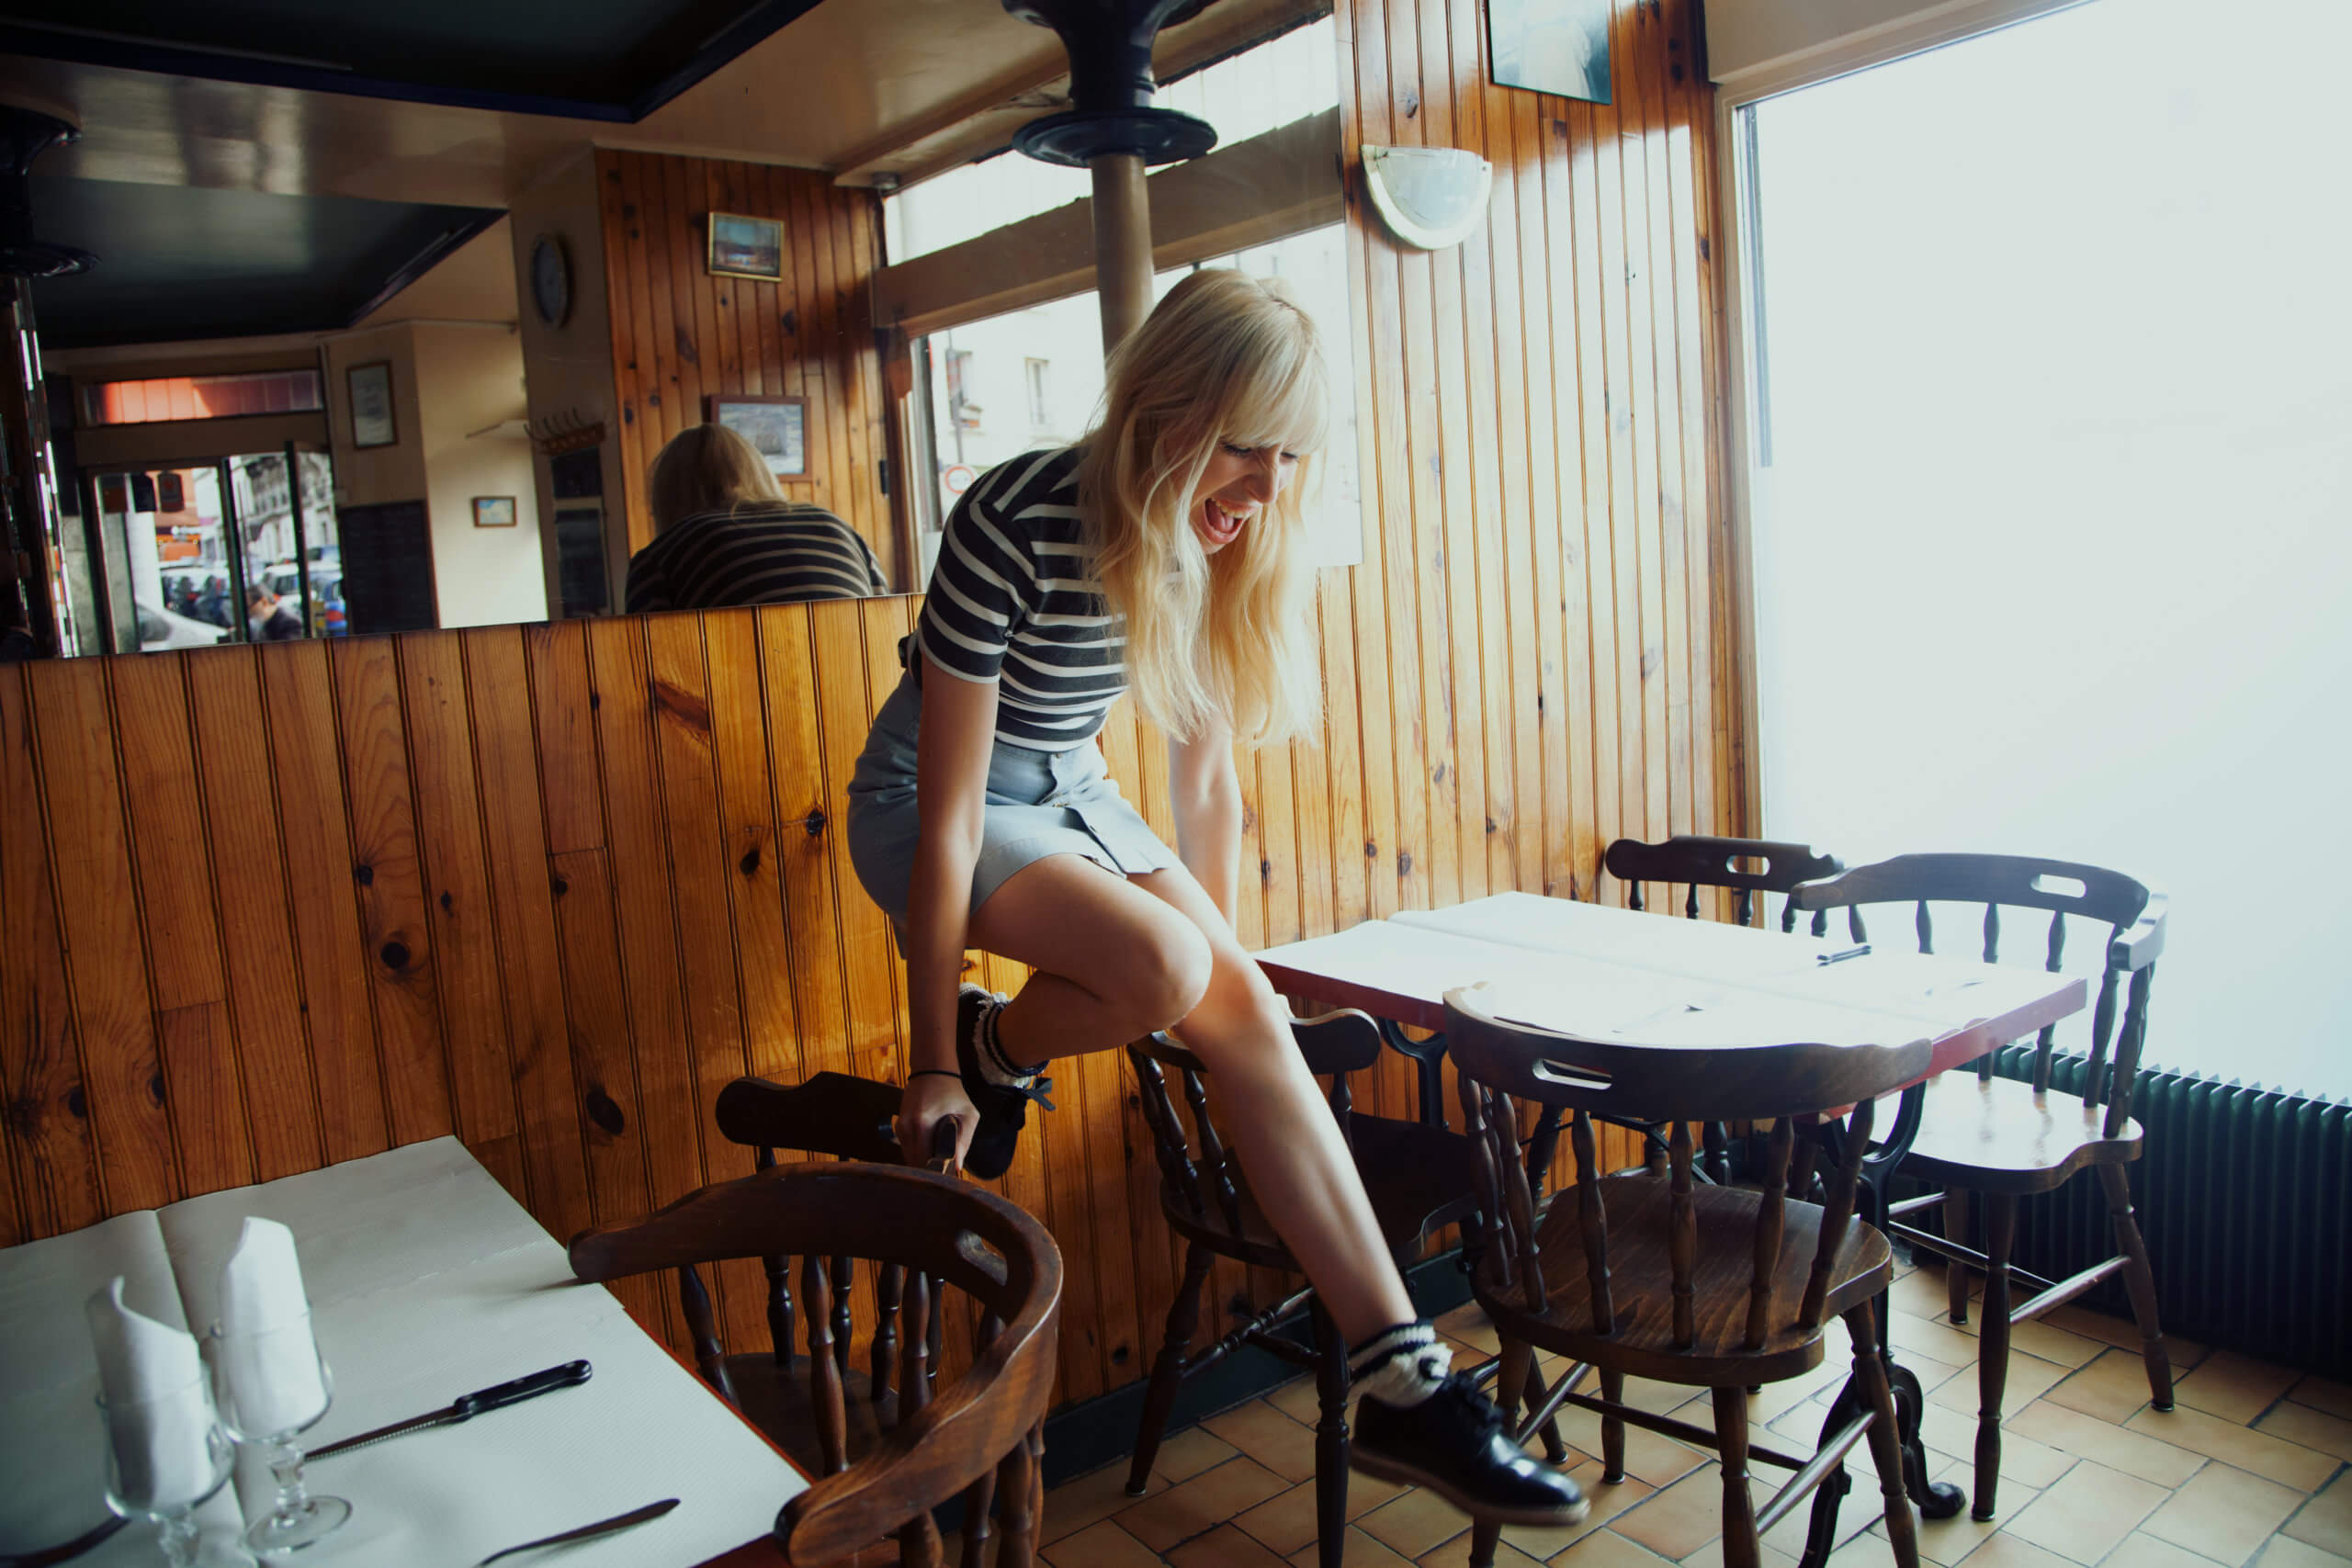 charlotte-pilat-tiphaine-03